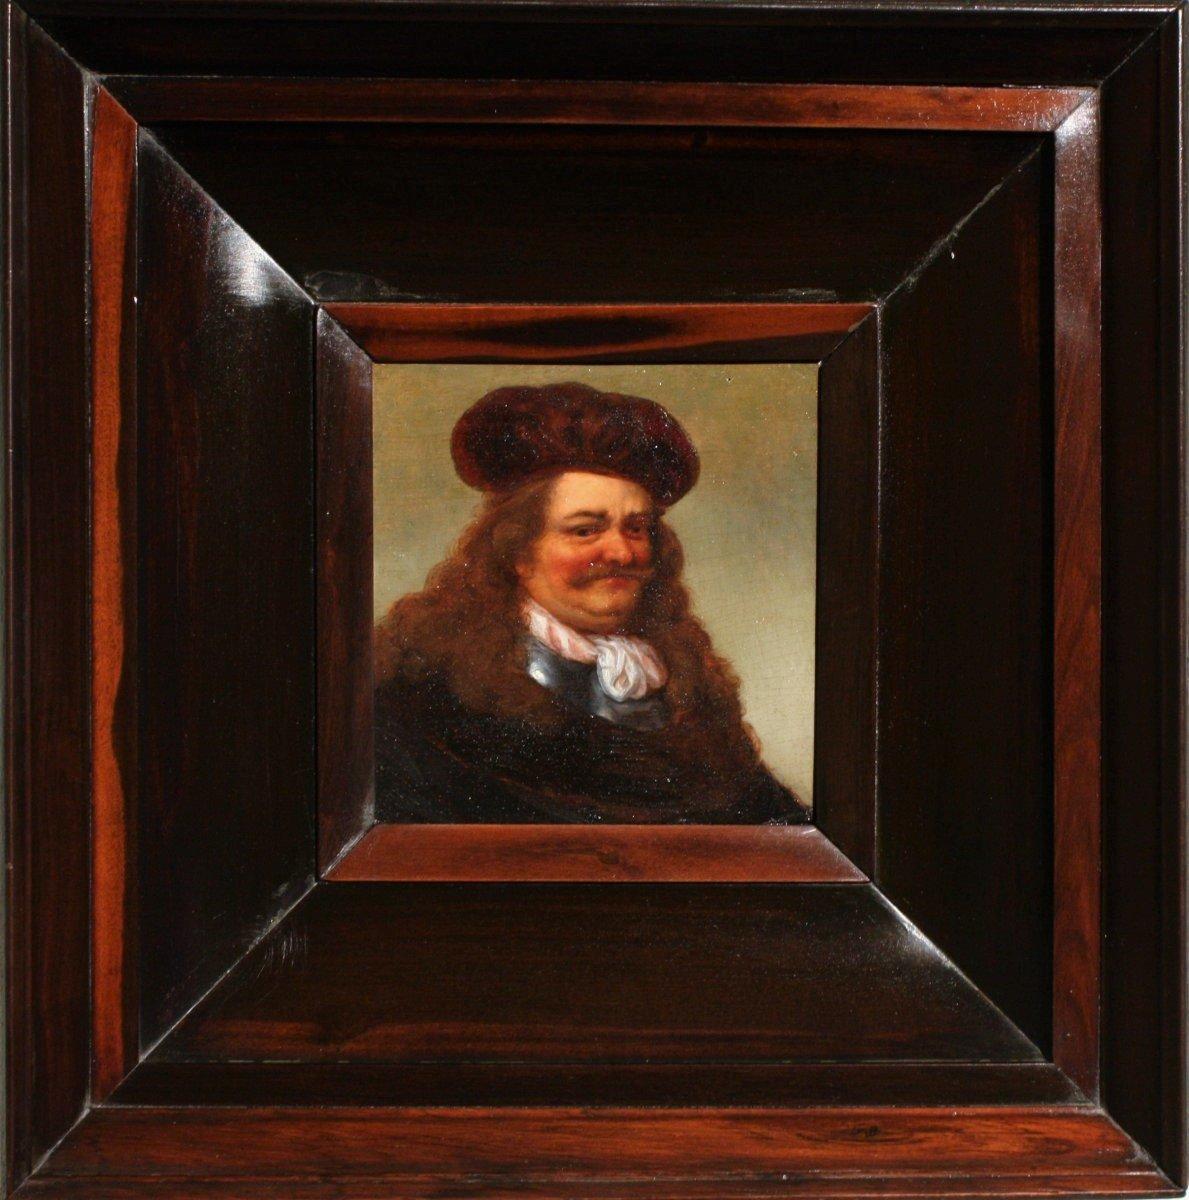 Portrait Of A Gentleman, 17th C., Circle Of Govaert Flinck